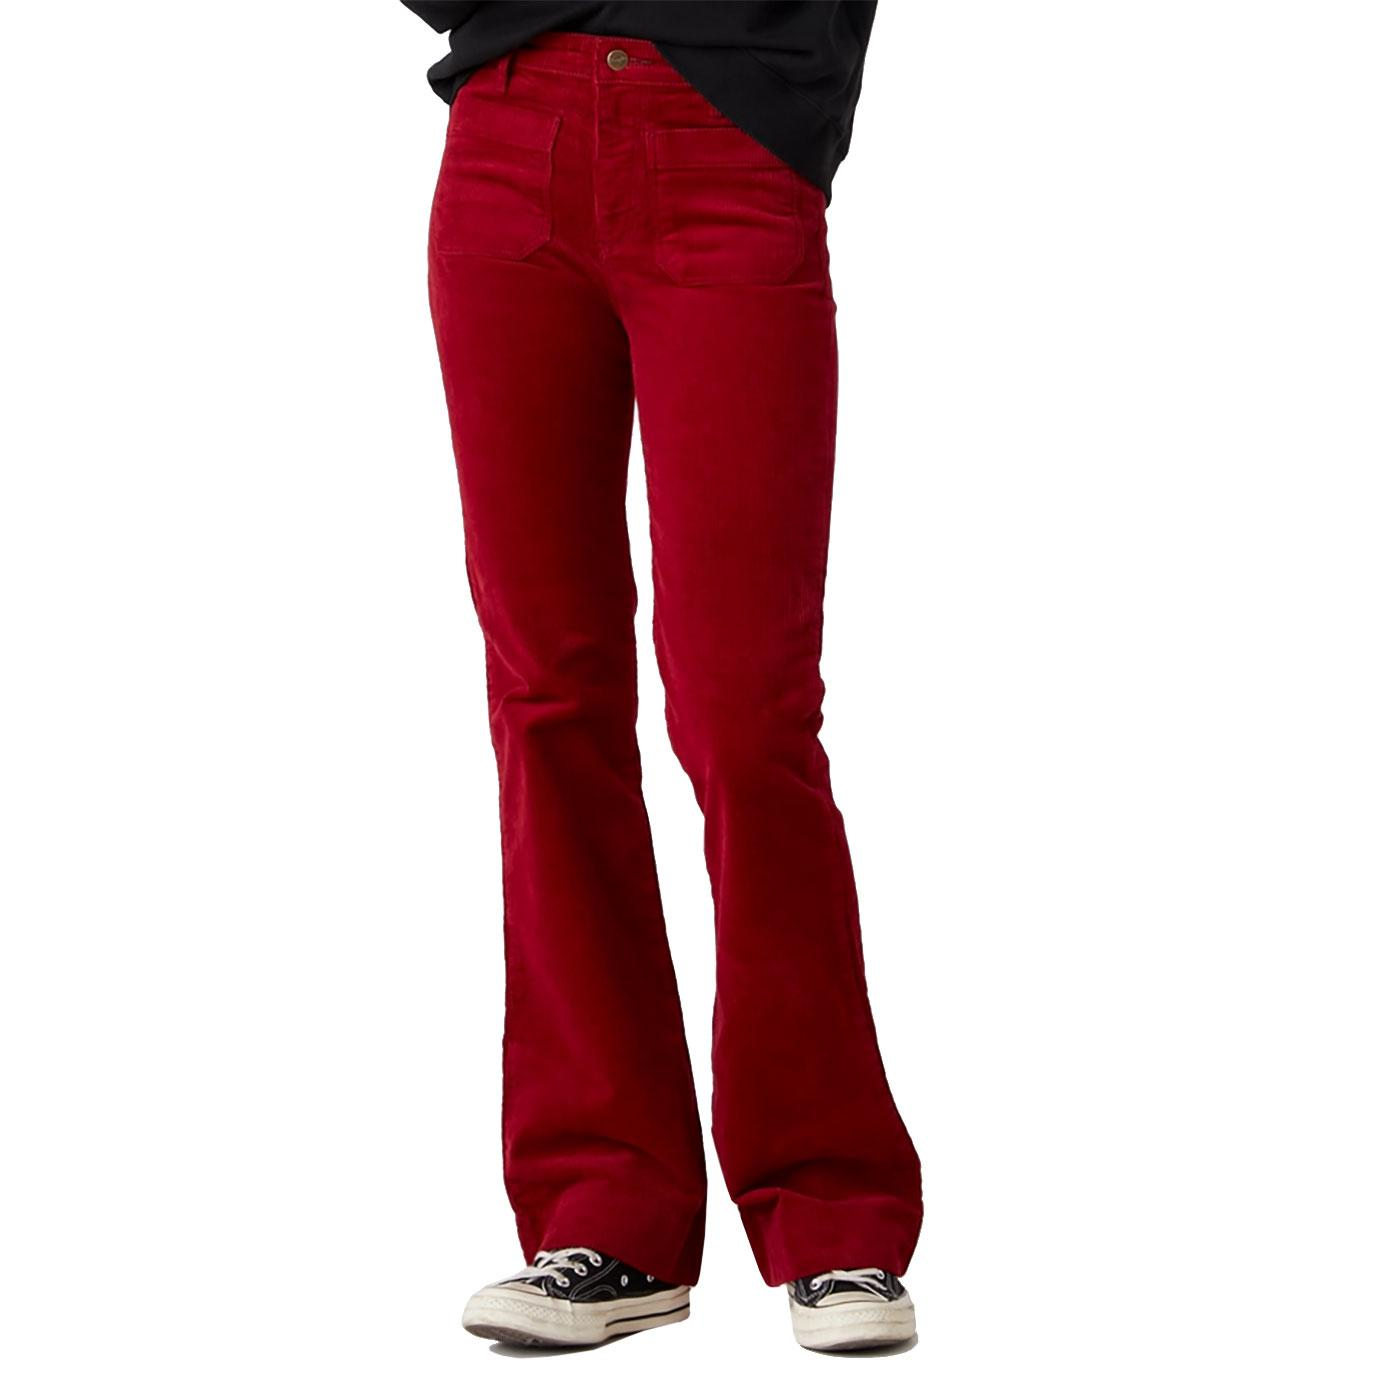 WRANGLER Retro Seventies Corduroy Flared Jeans RR